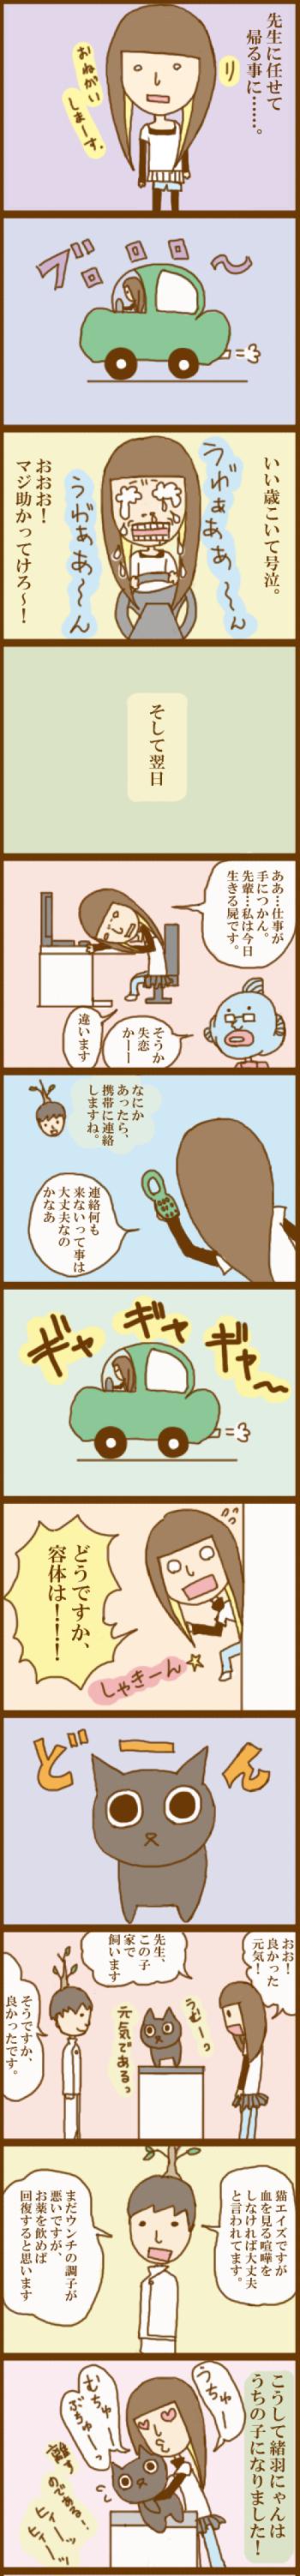 f:id:suzuokayu:20201031171815j:plain